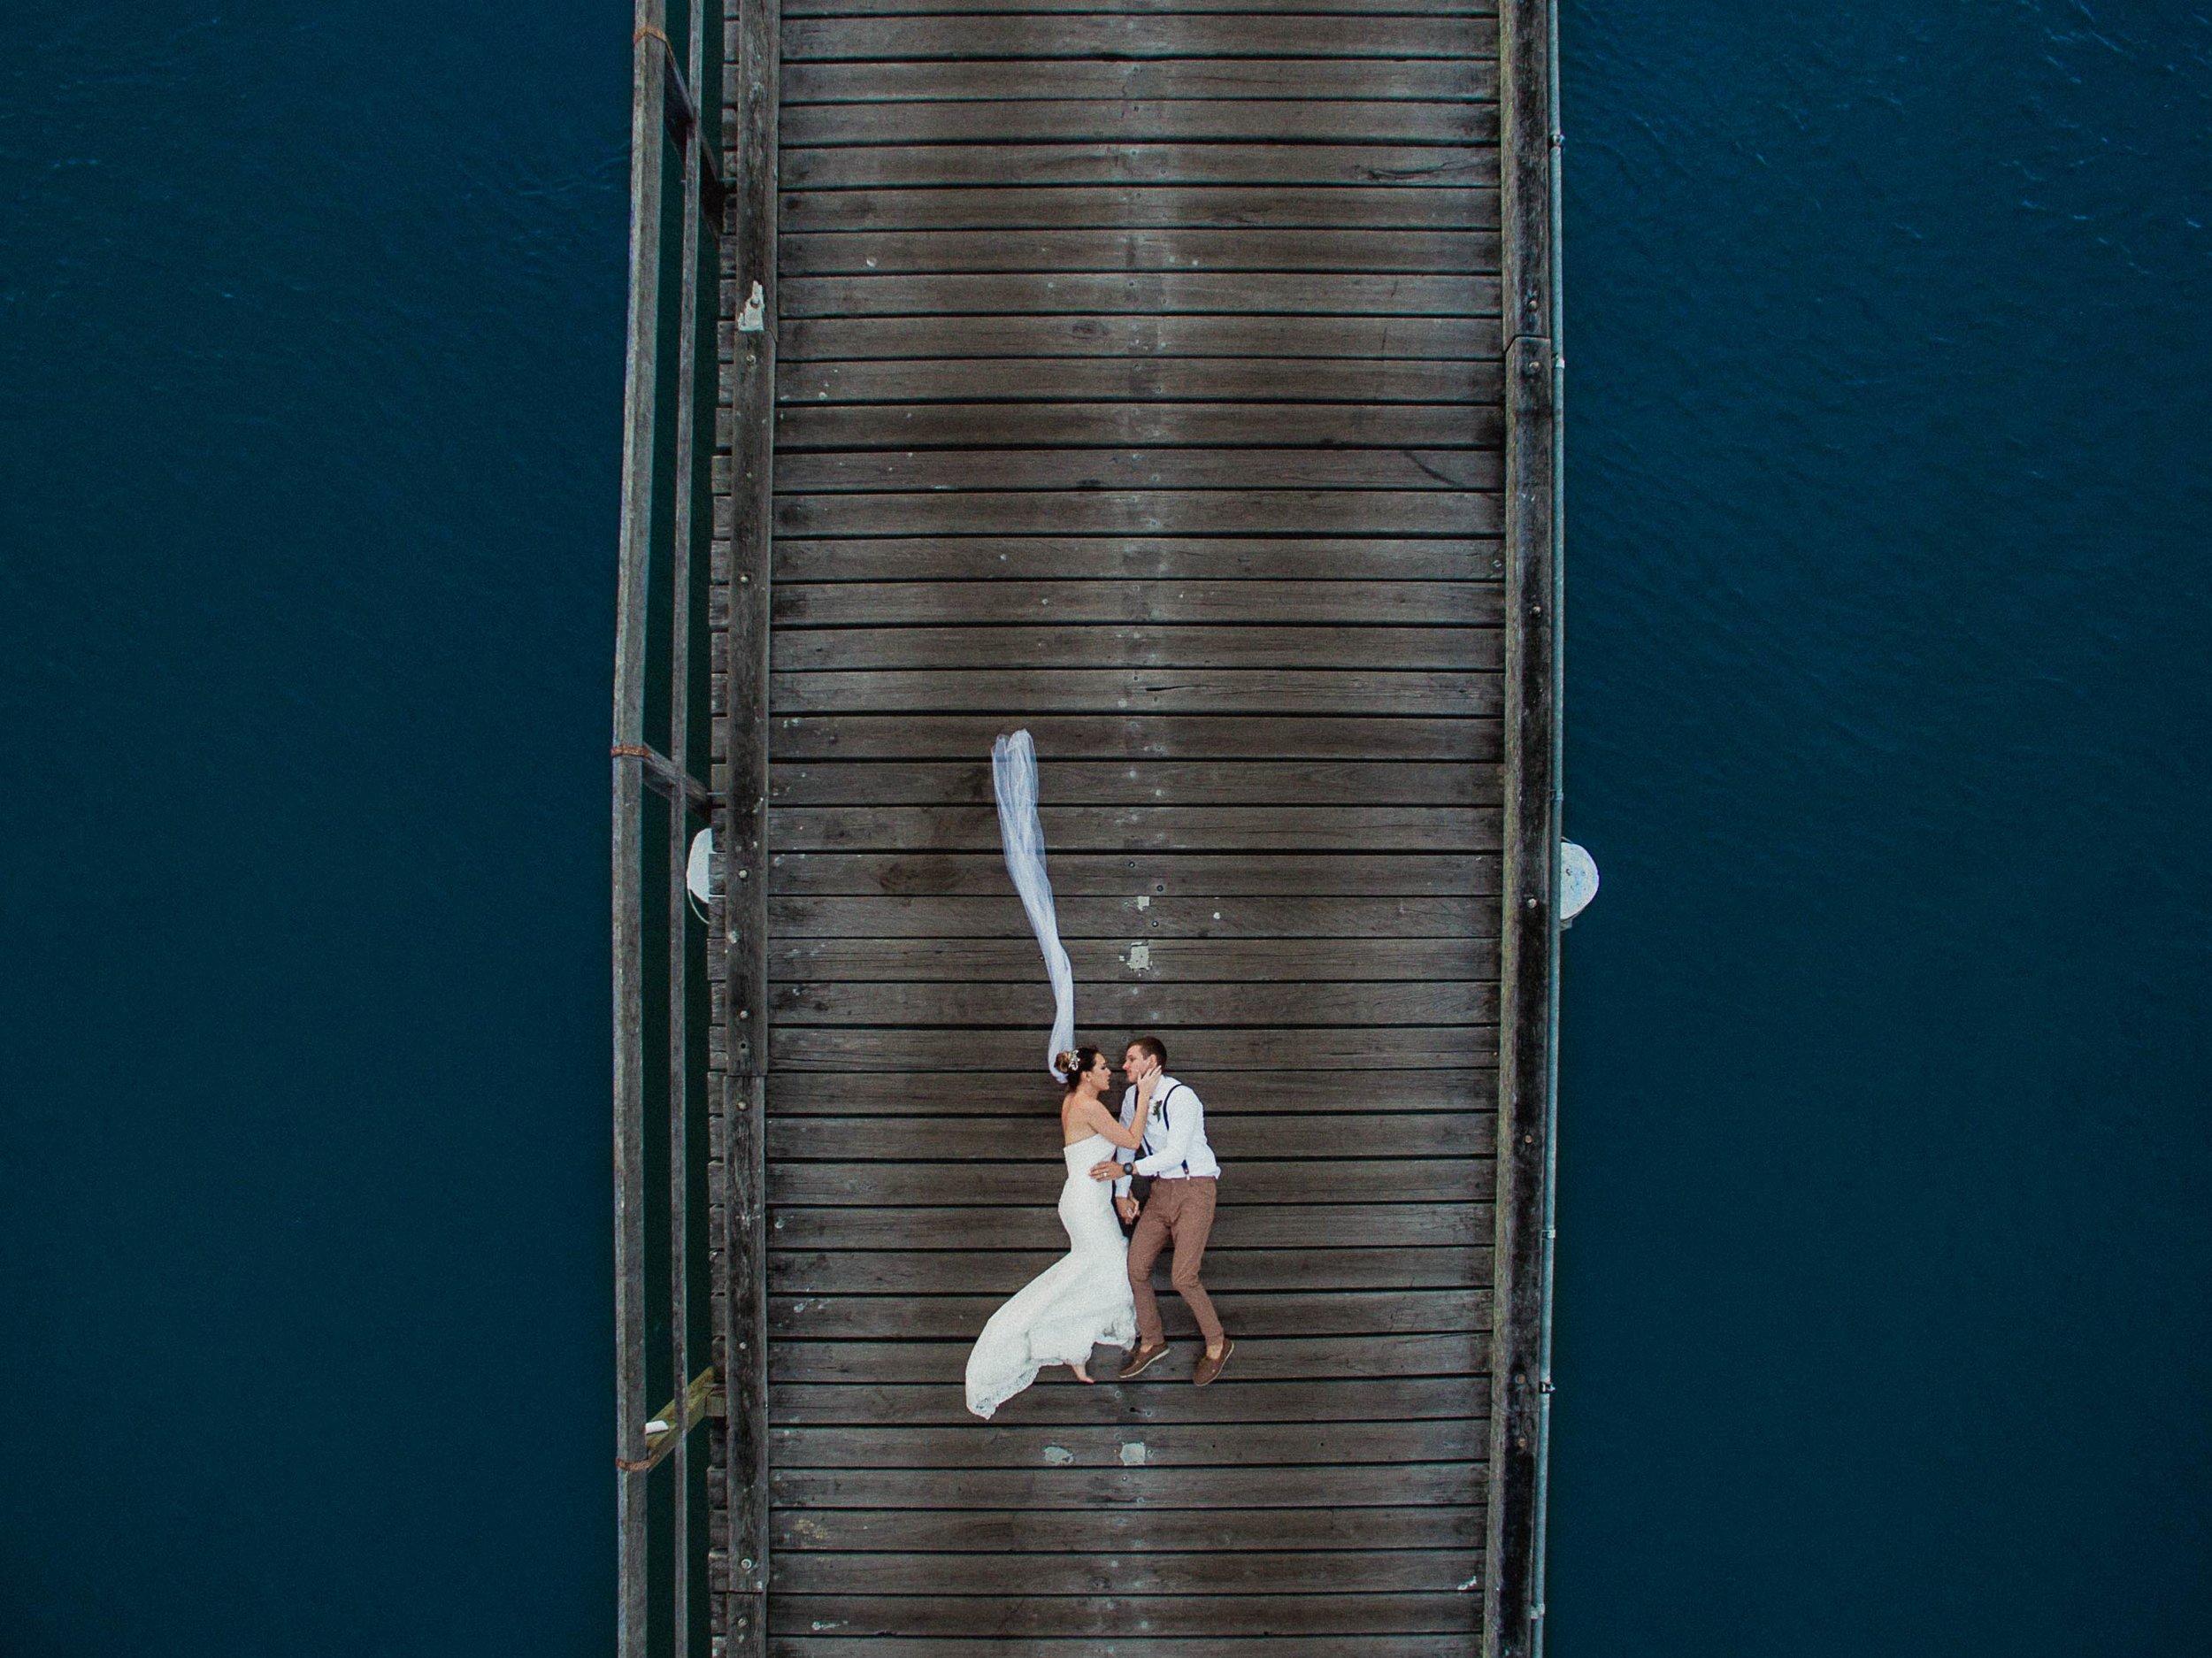 Top Noosa & Coolum Beach Destination Wedding Photographer - Sunshine Coast, Queensland, Australian